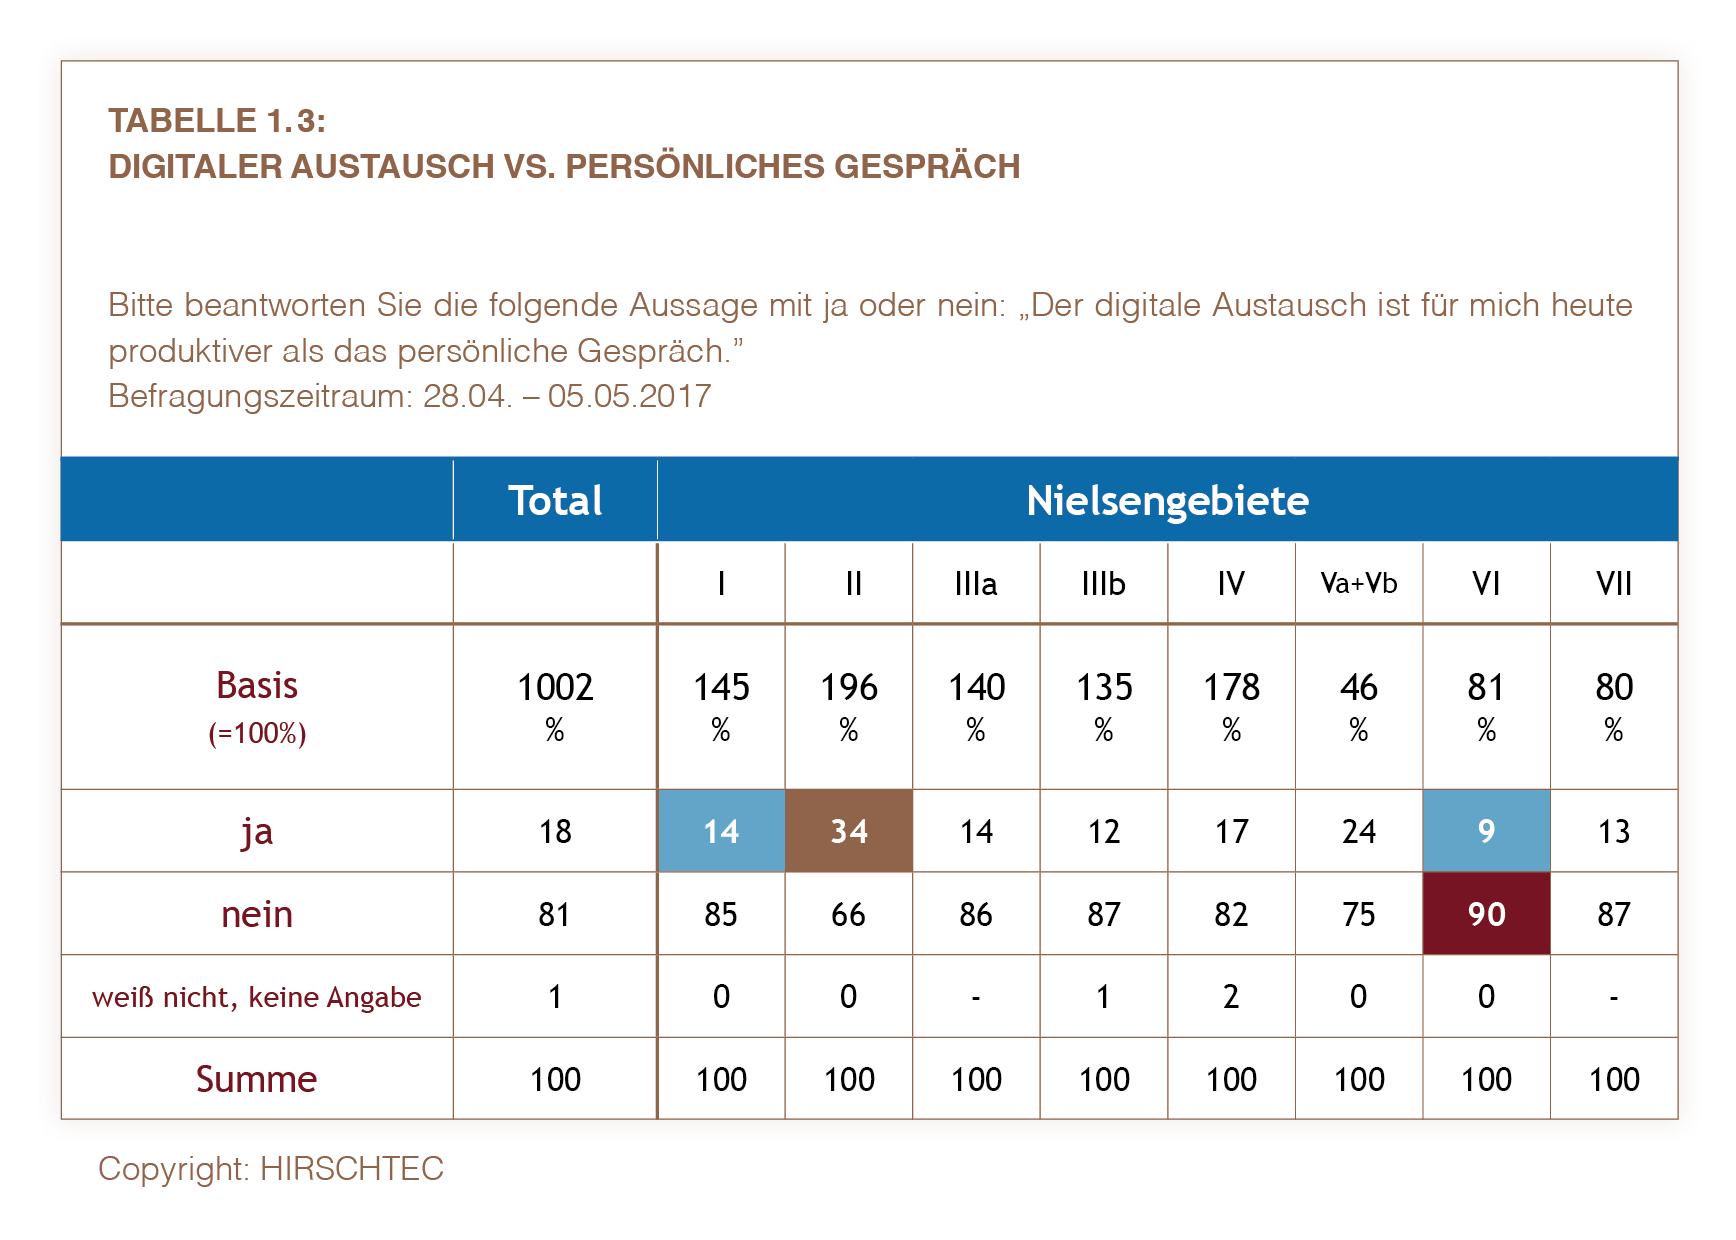 Hh Tabelle 1.3